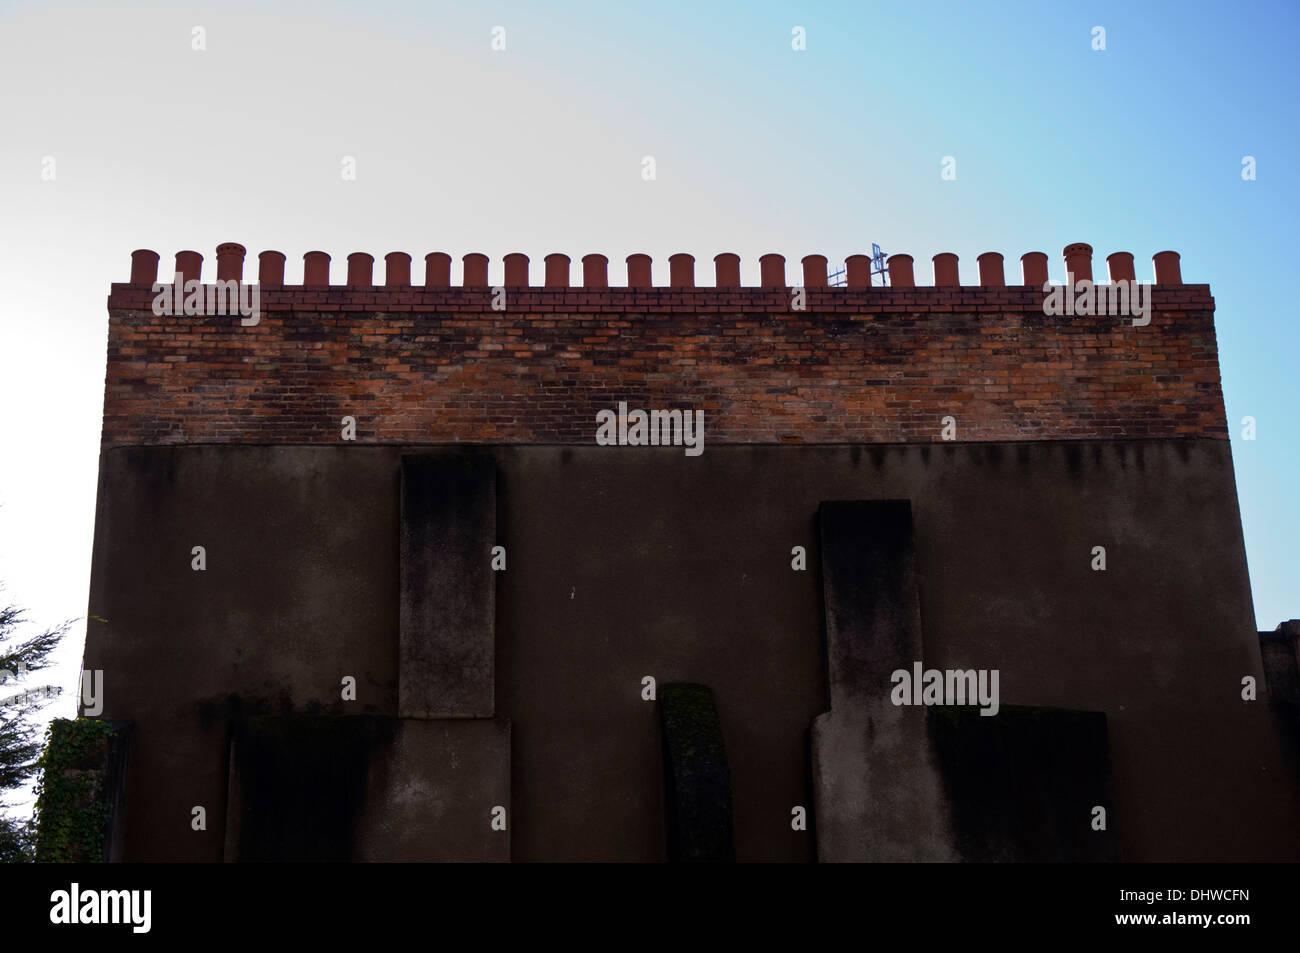 Twenty five 25 chimney pots in a row - Stock Image